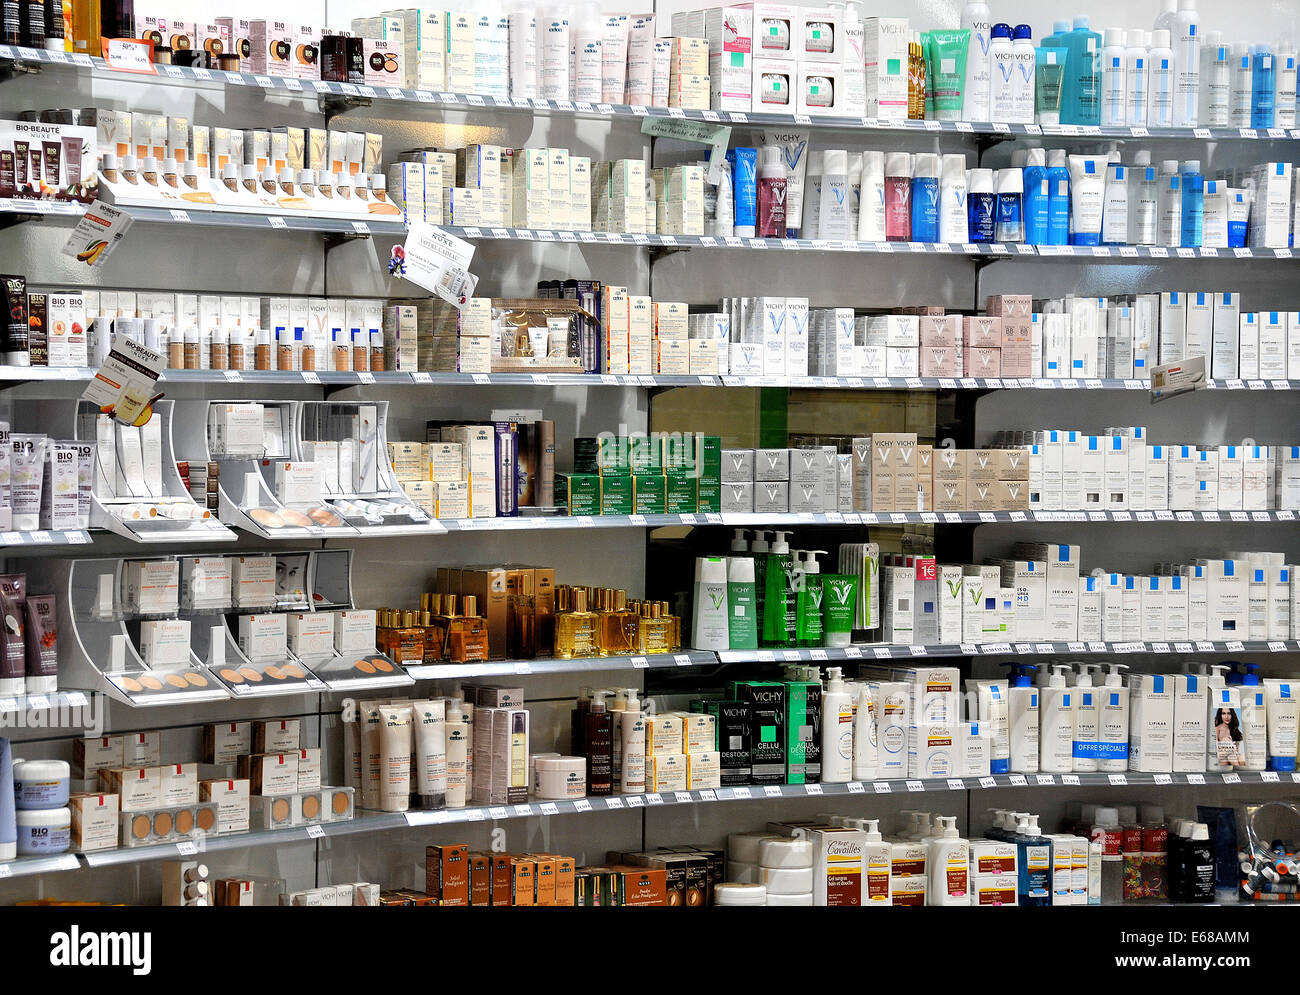 Schönheit Produkte Apotheke Satolas Frankreich Stockbild